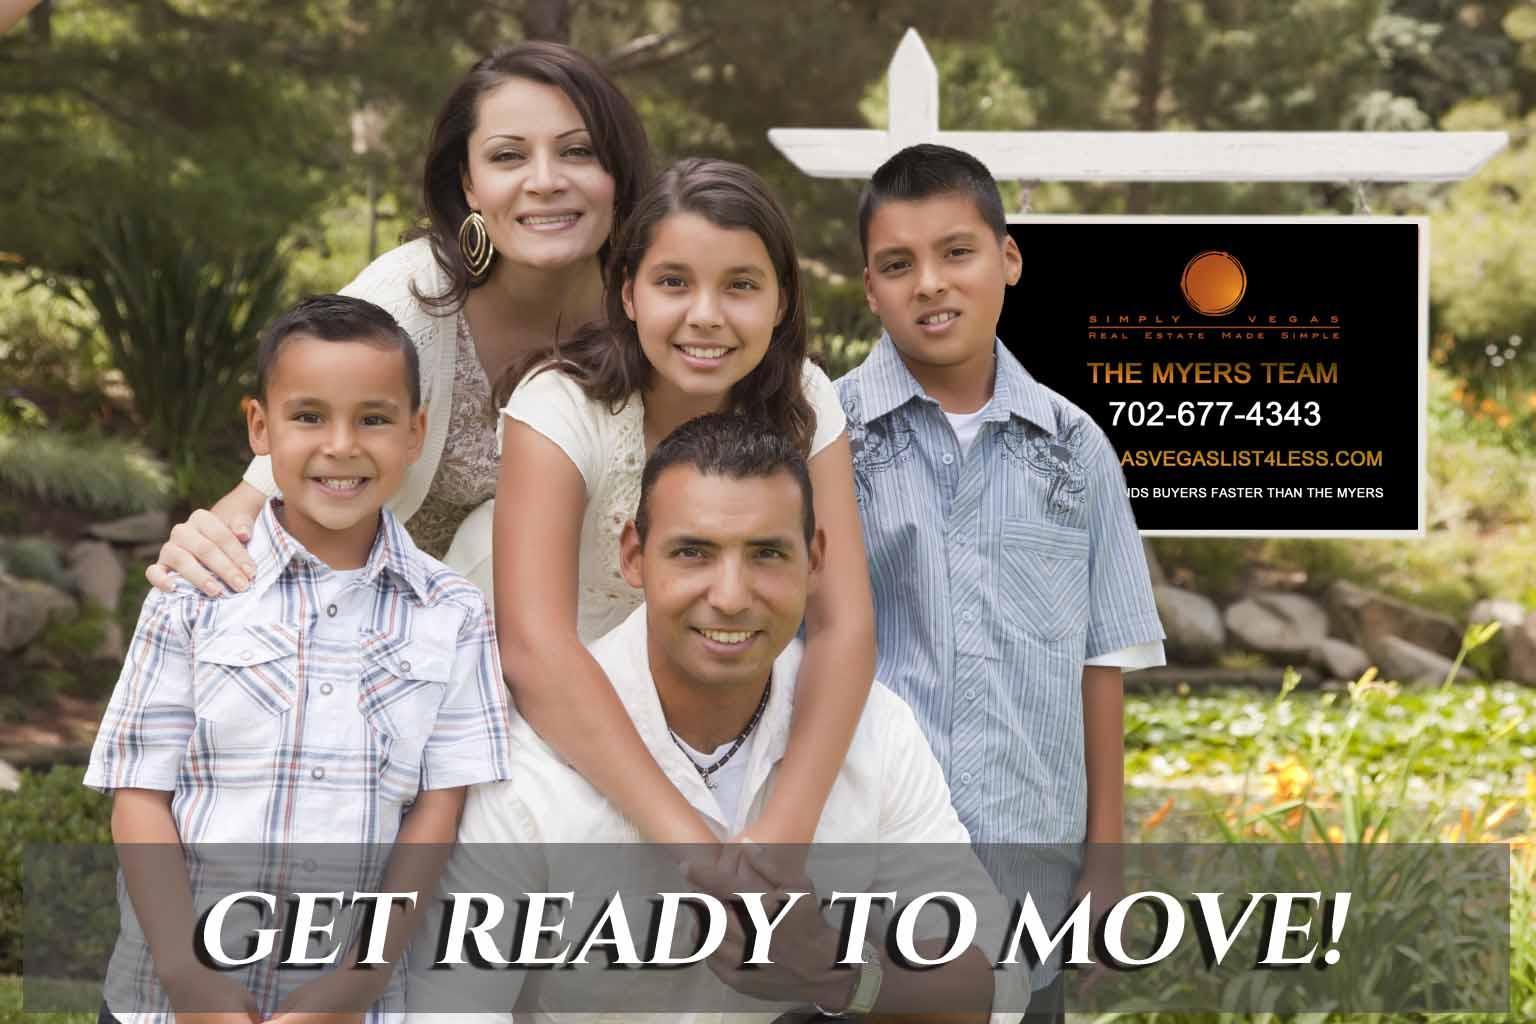 Top Realtors For Las Vegas Home Sellers